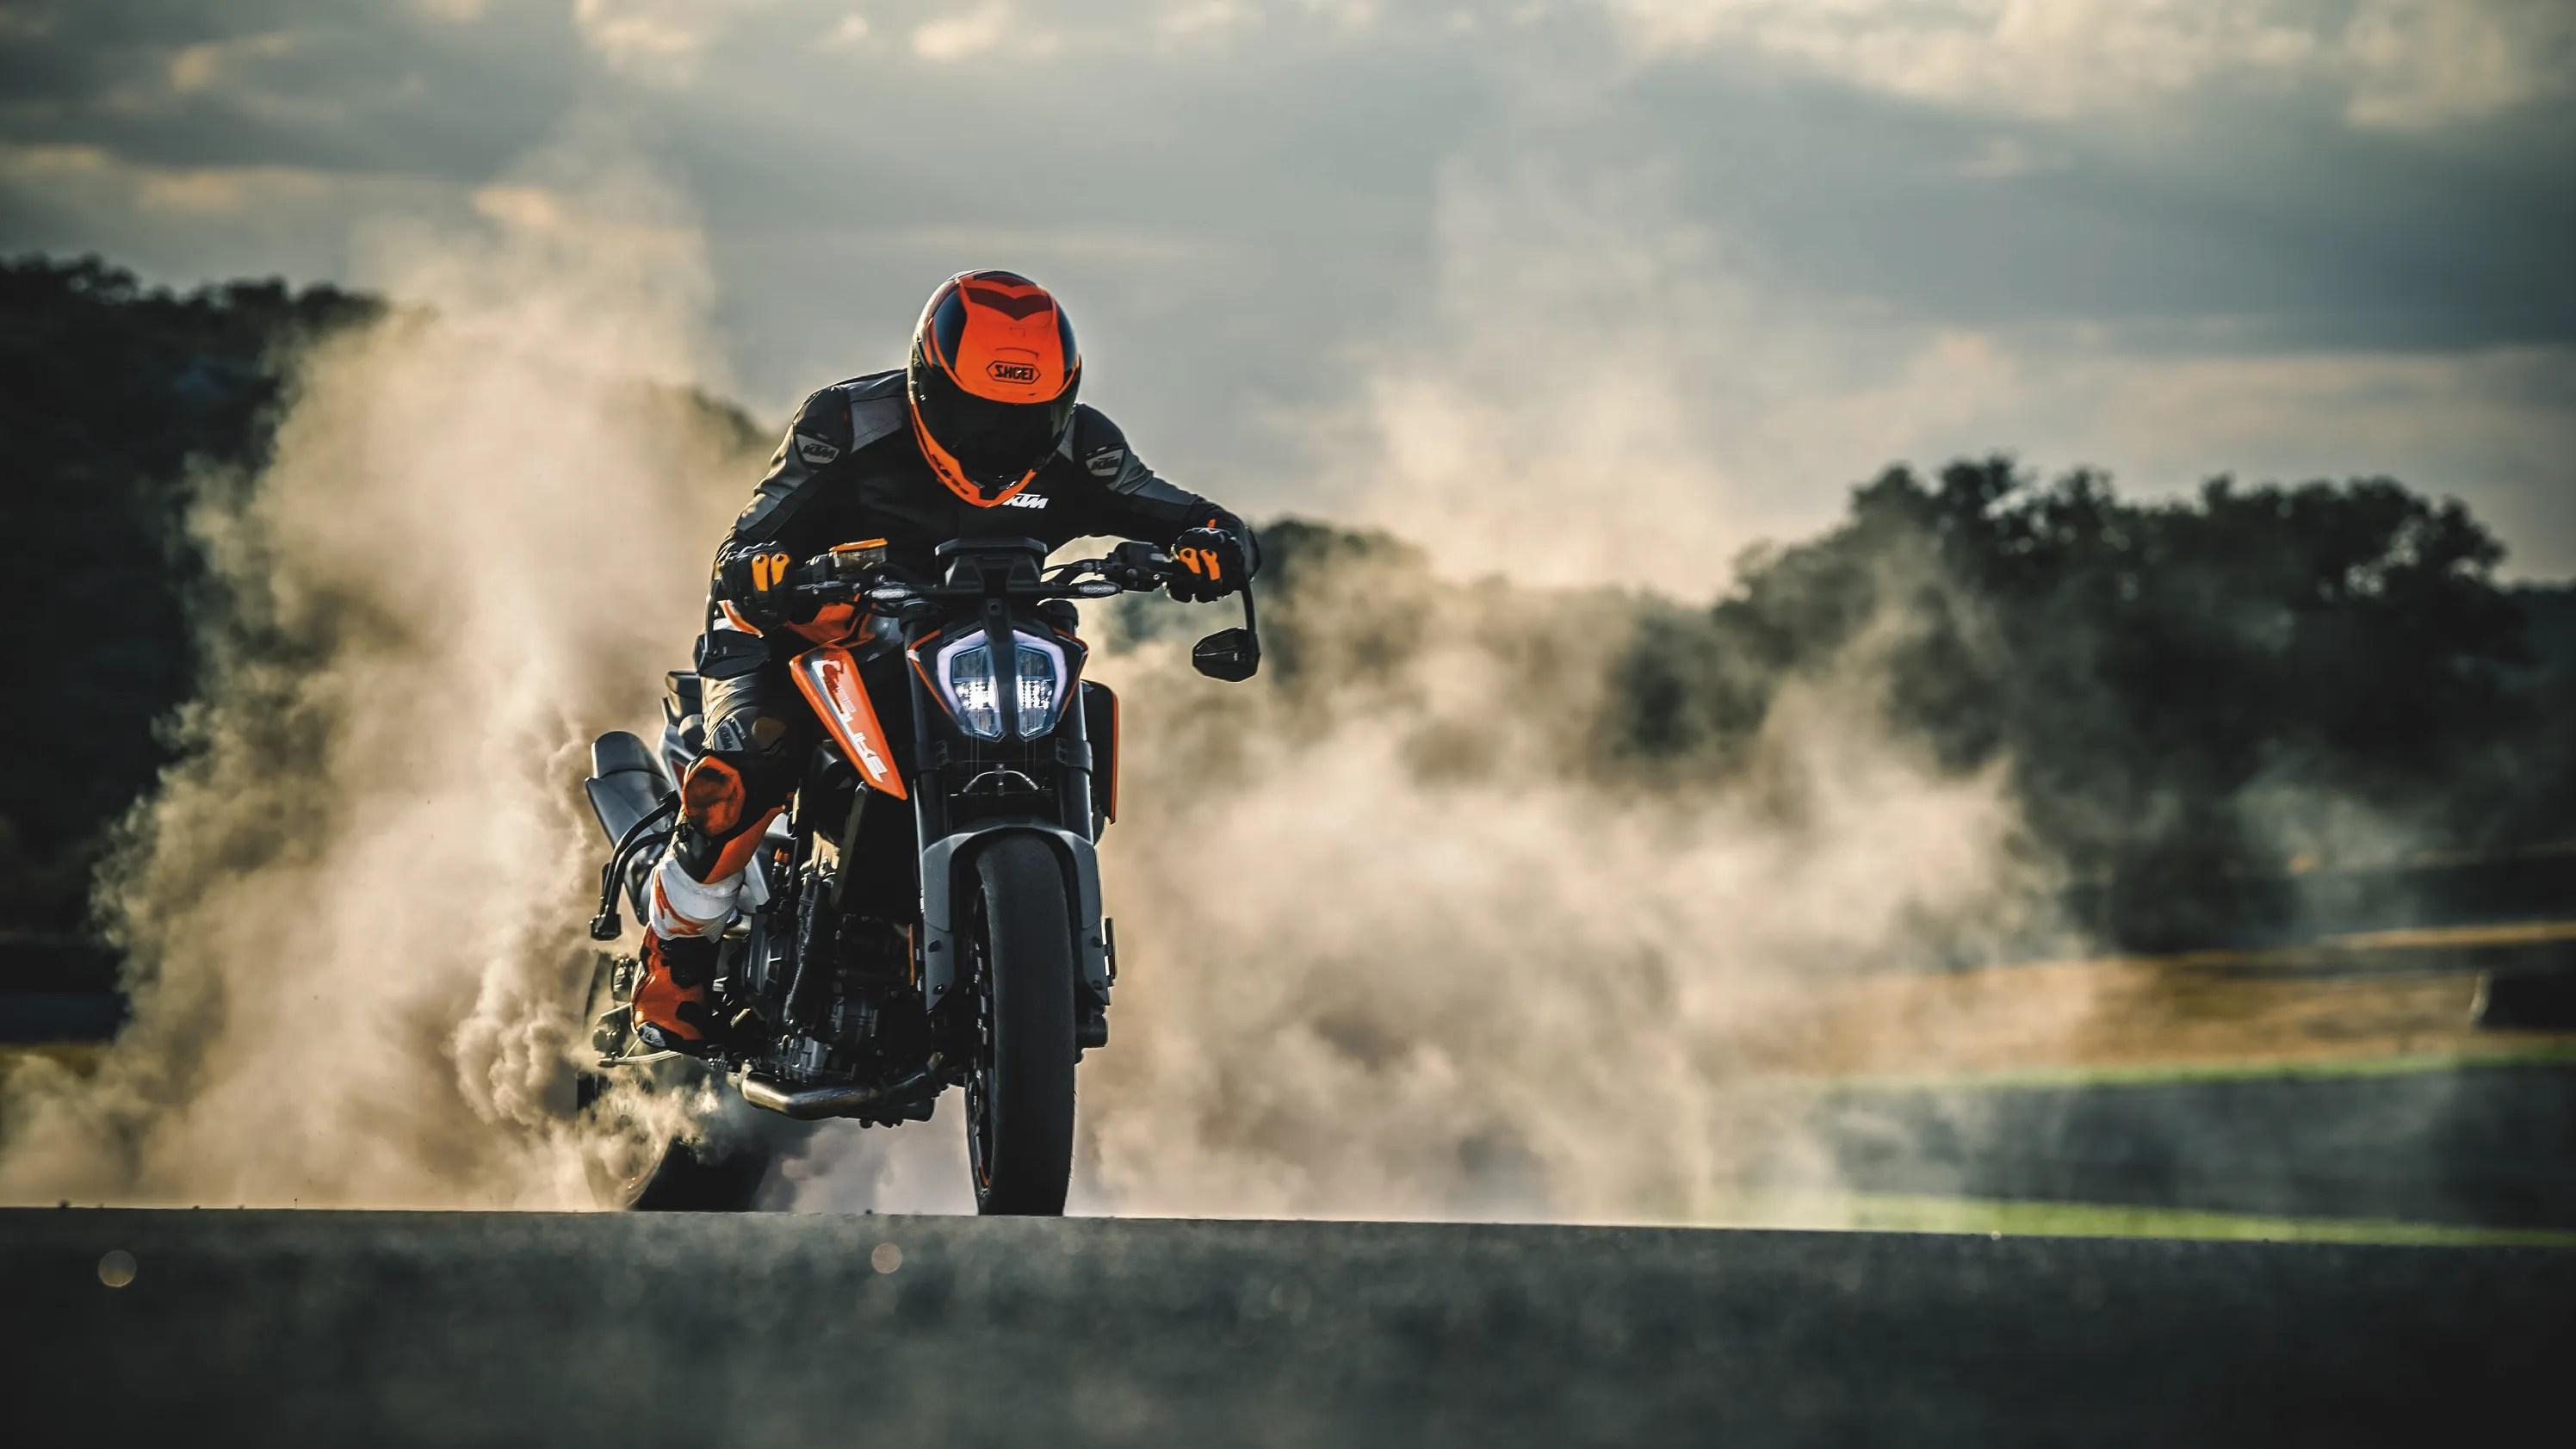 Ktm Duke Bike Hd Wallpaper 2018 Ktm 790 Duke Top Speed